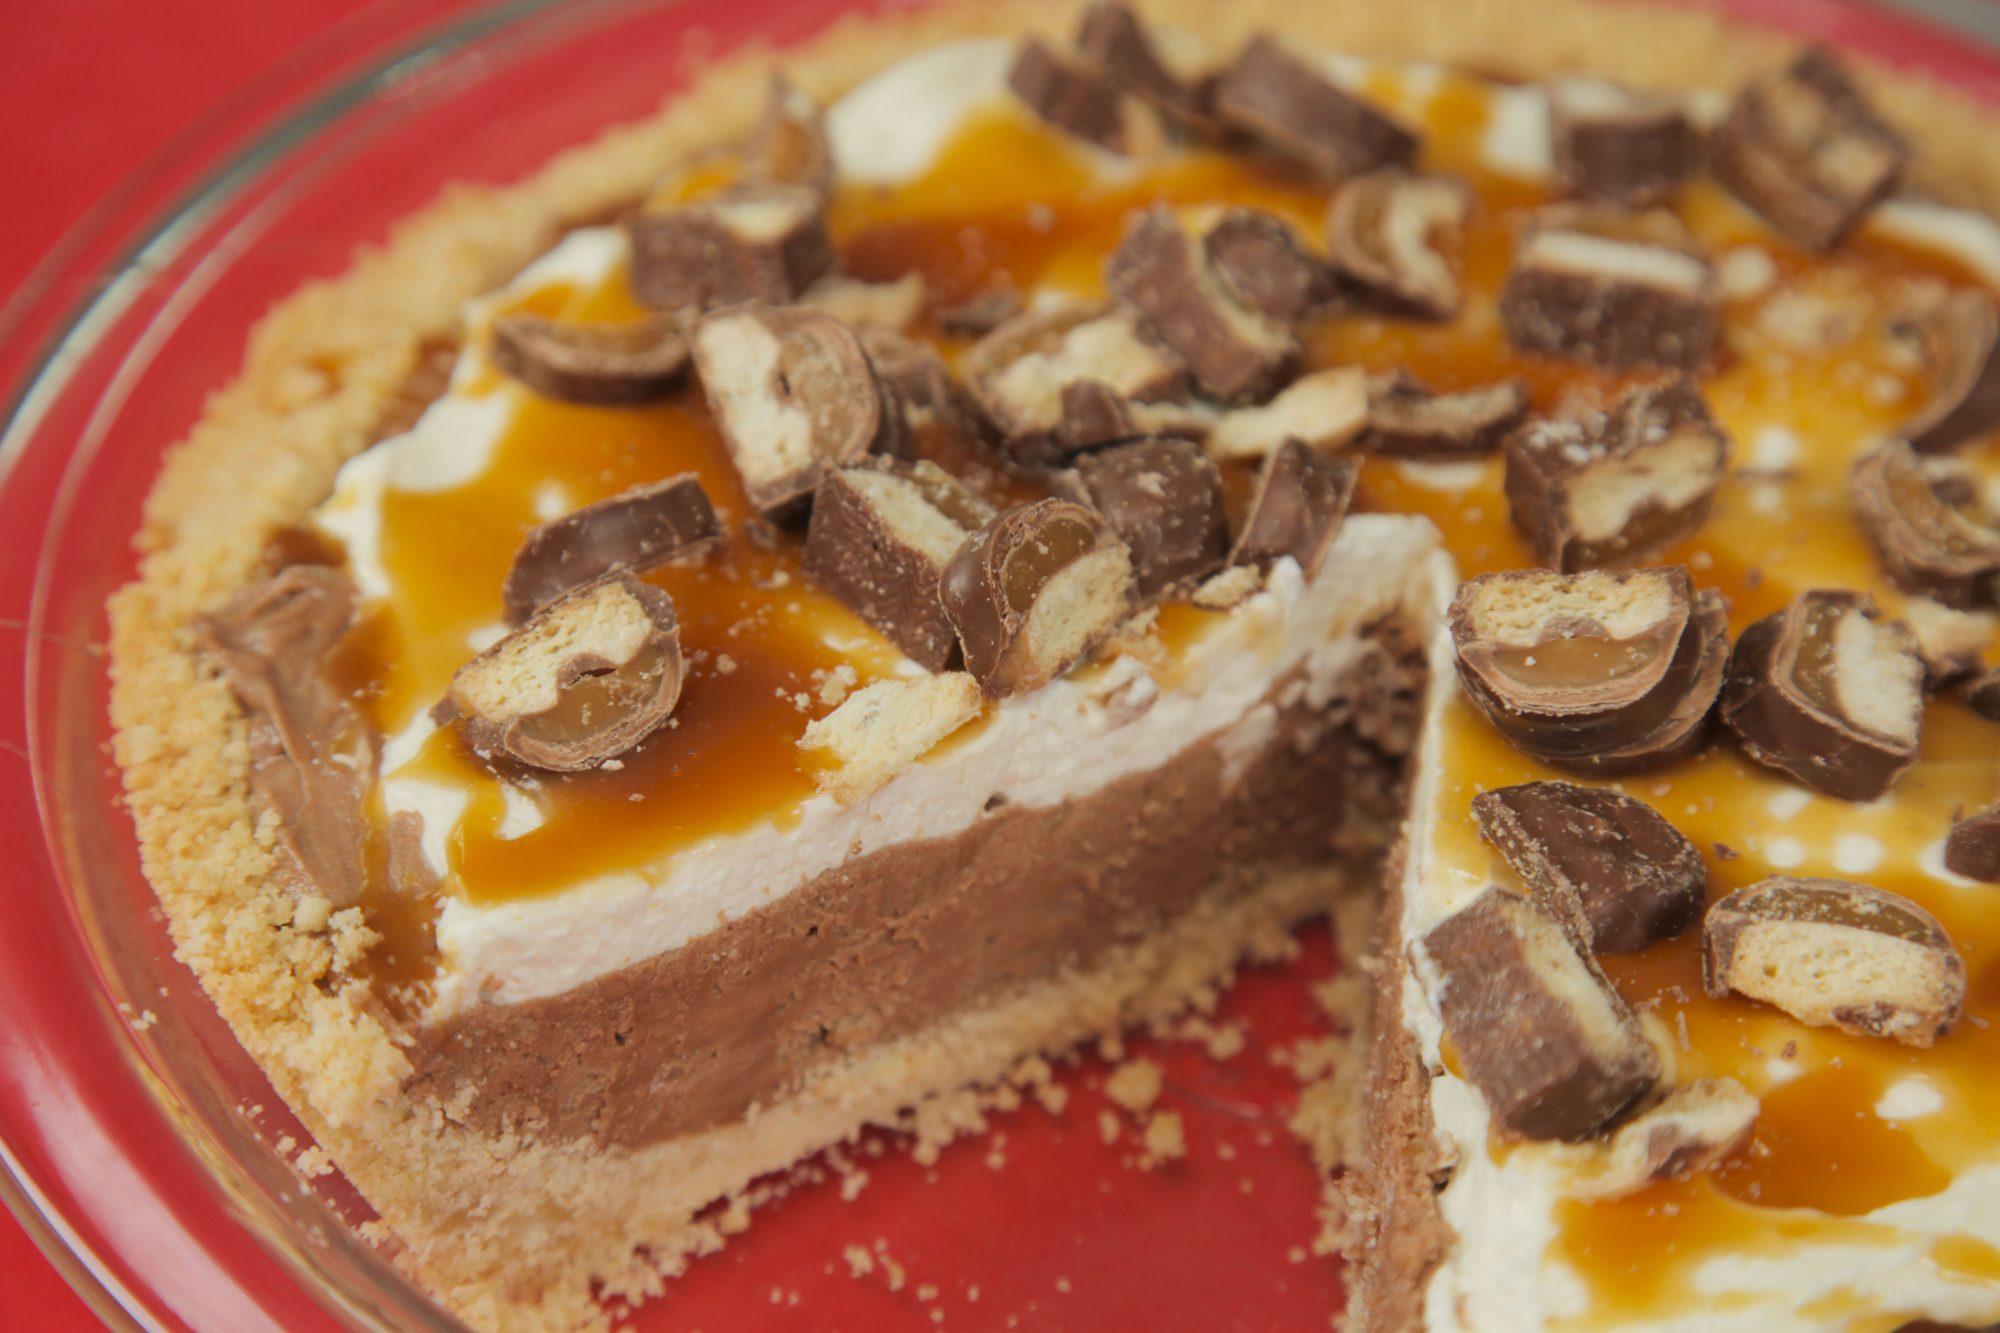 30 Nut-Free Desserts That Won't Trigger Allergies